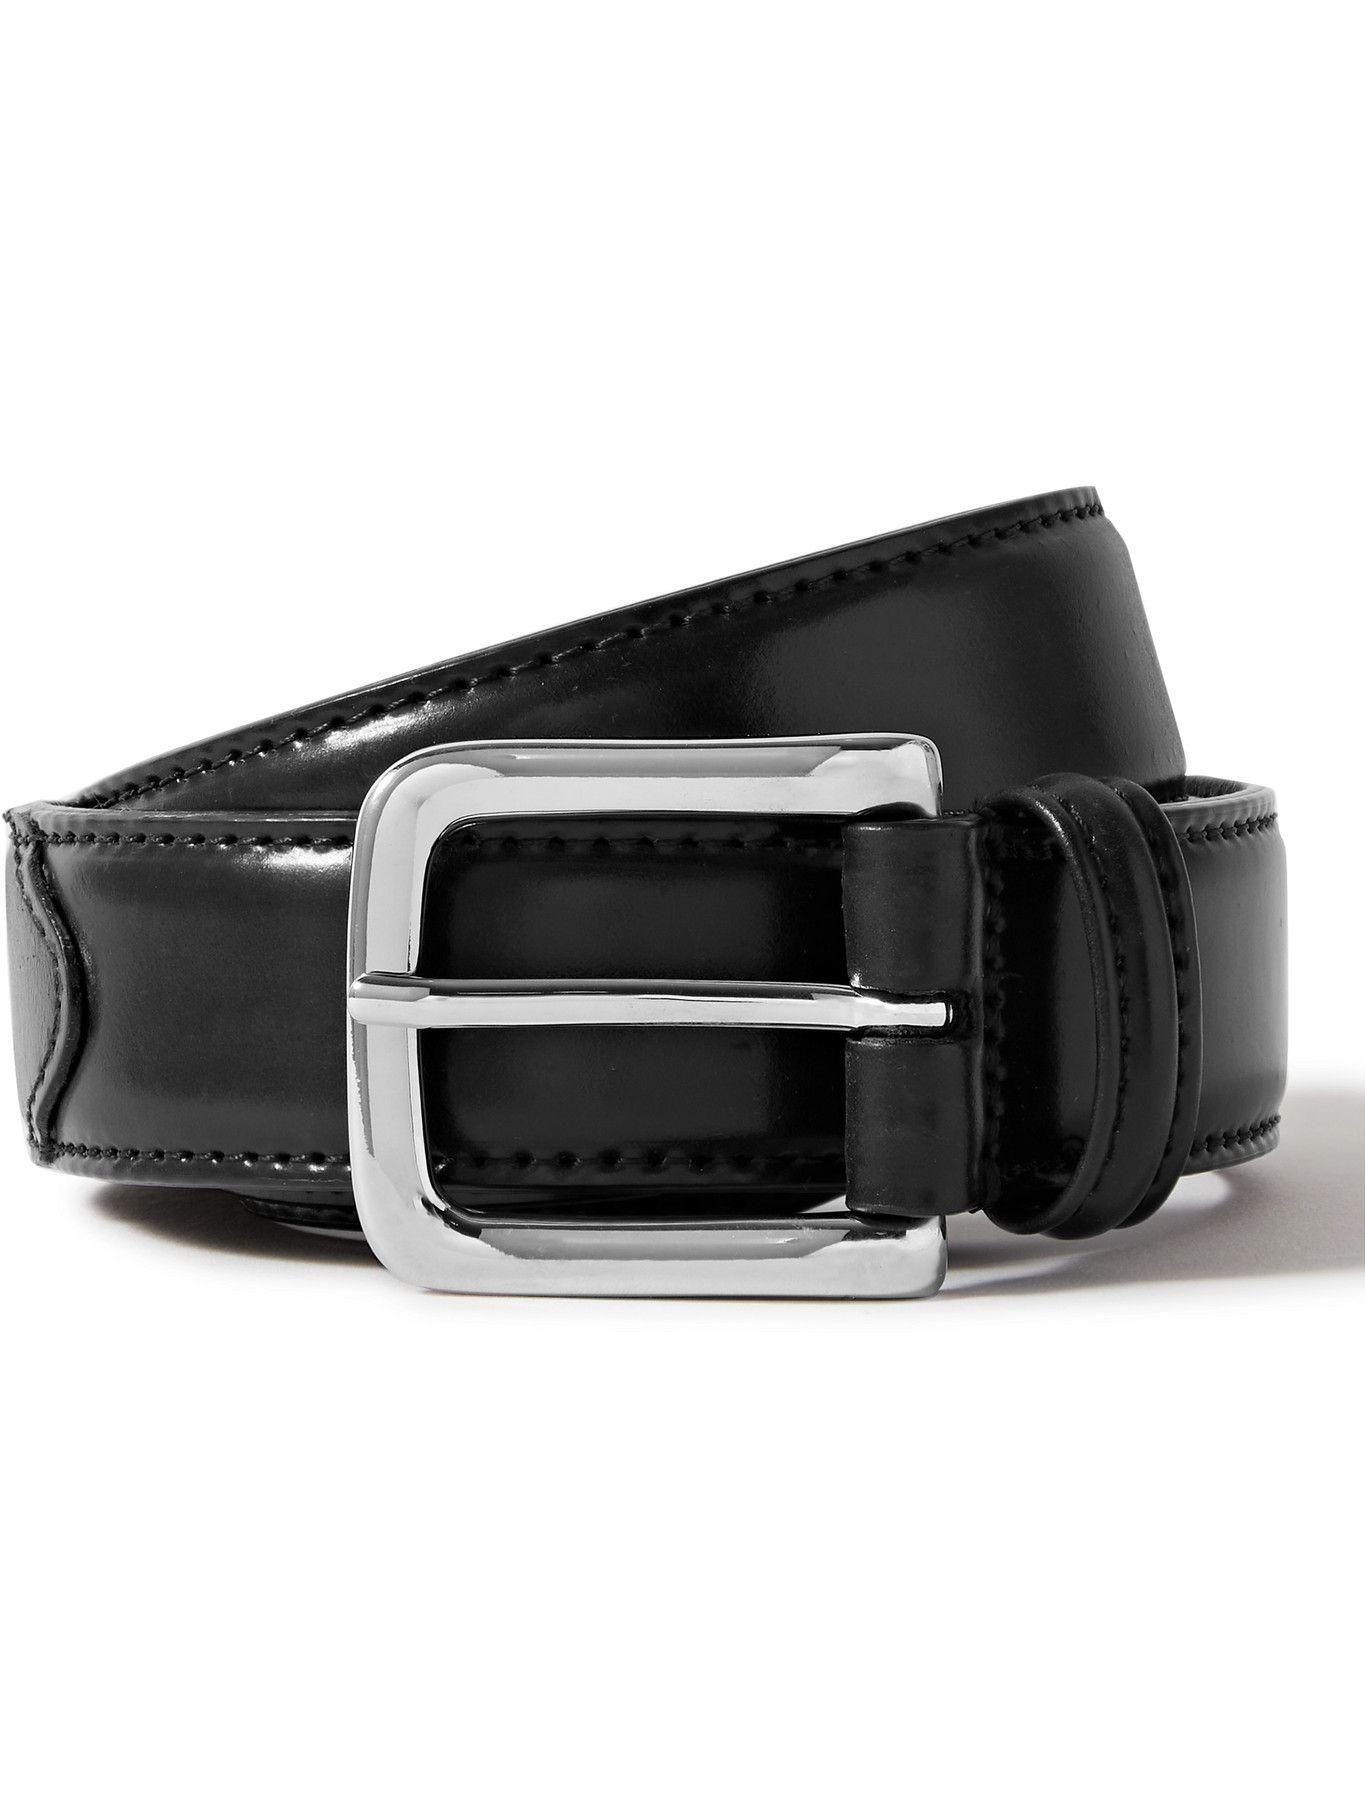 Photo: ANDERSON'S - 4cm Black Leather Belt - Black